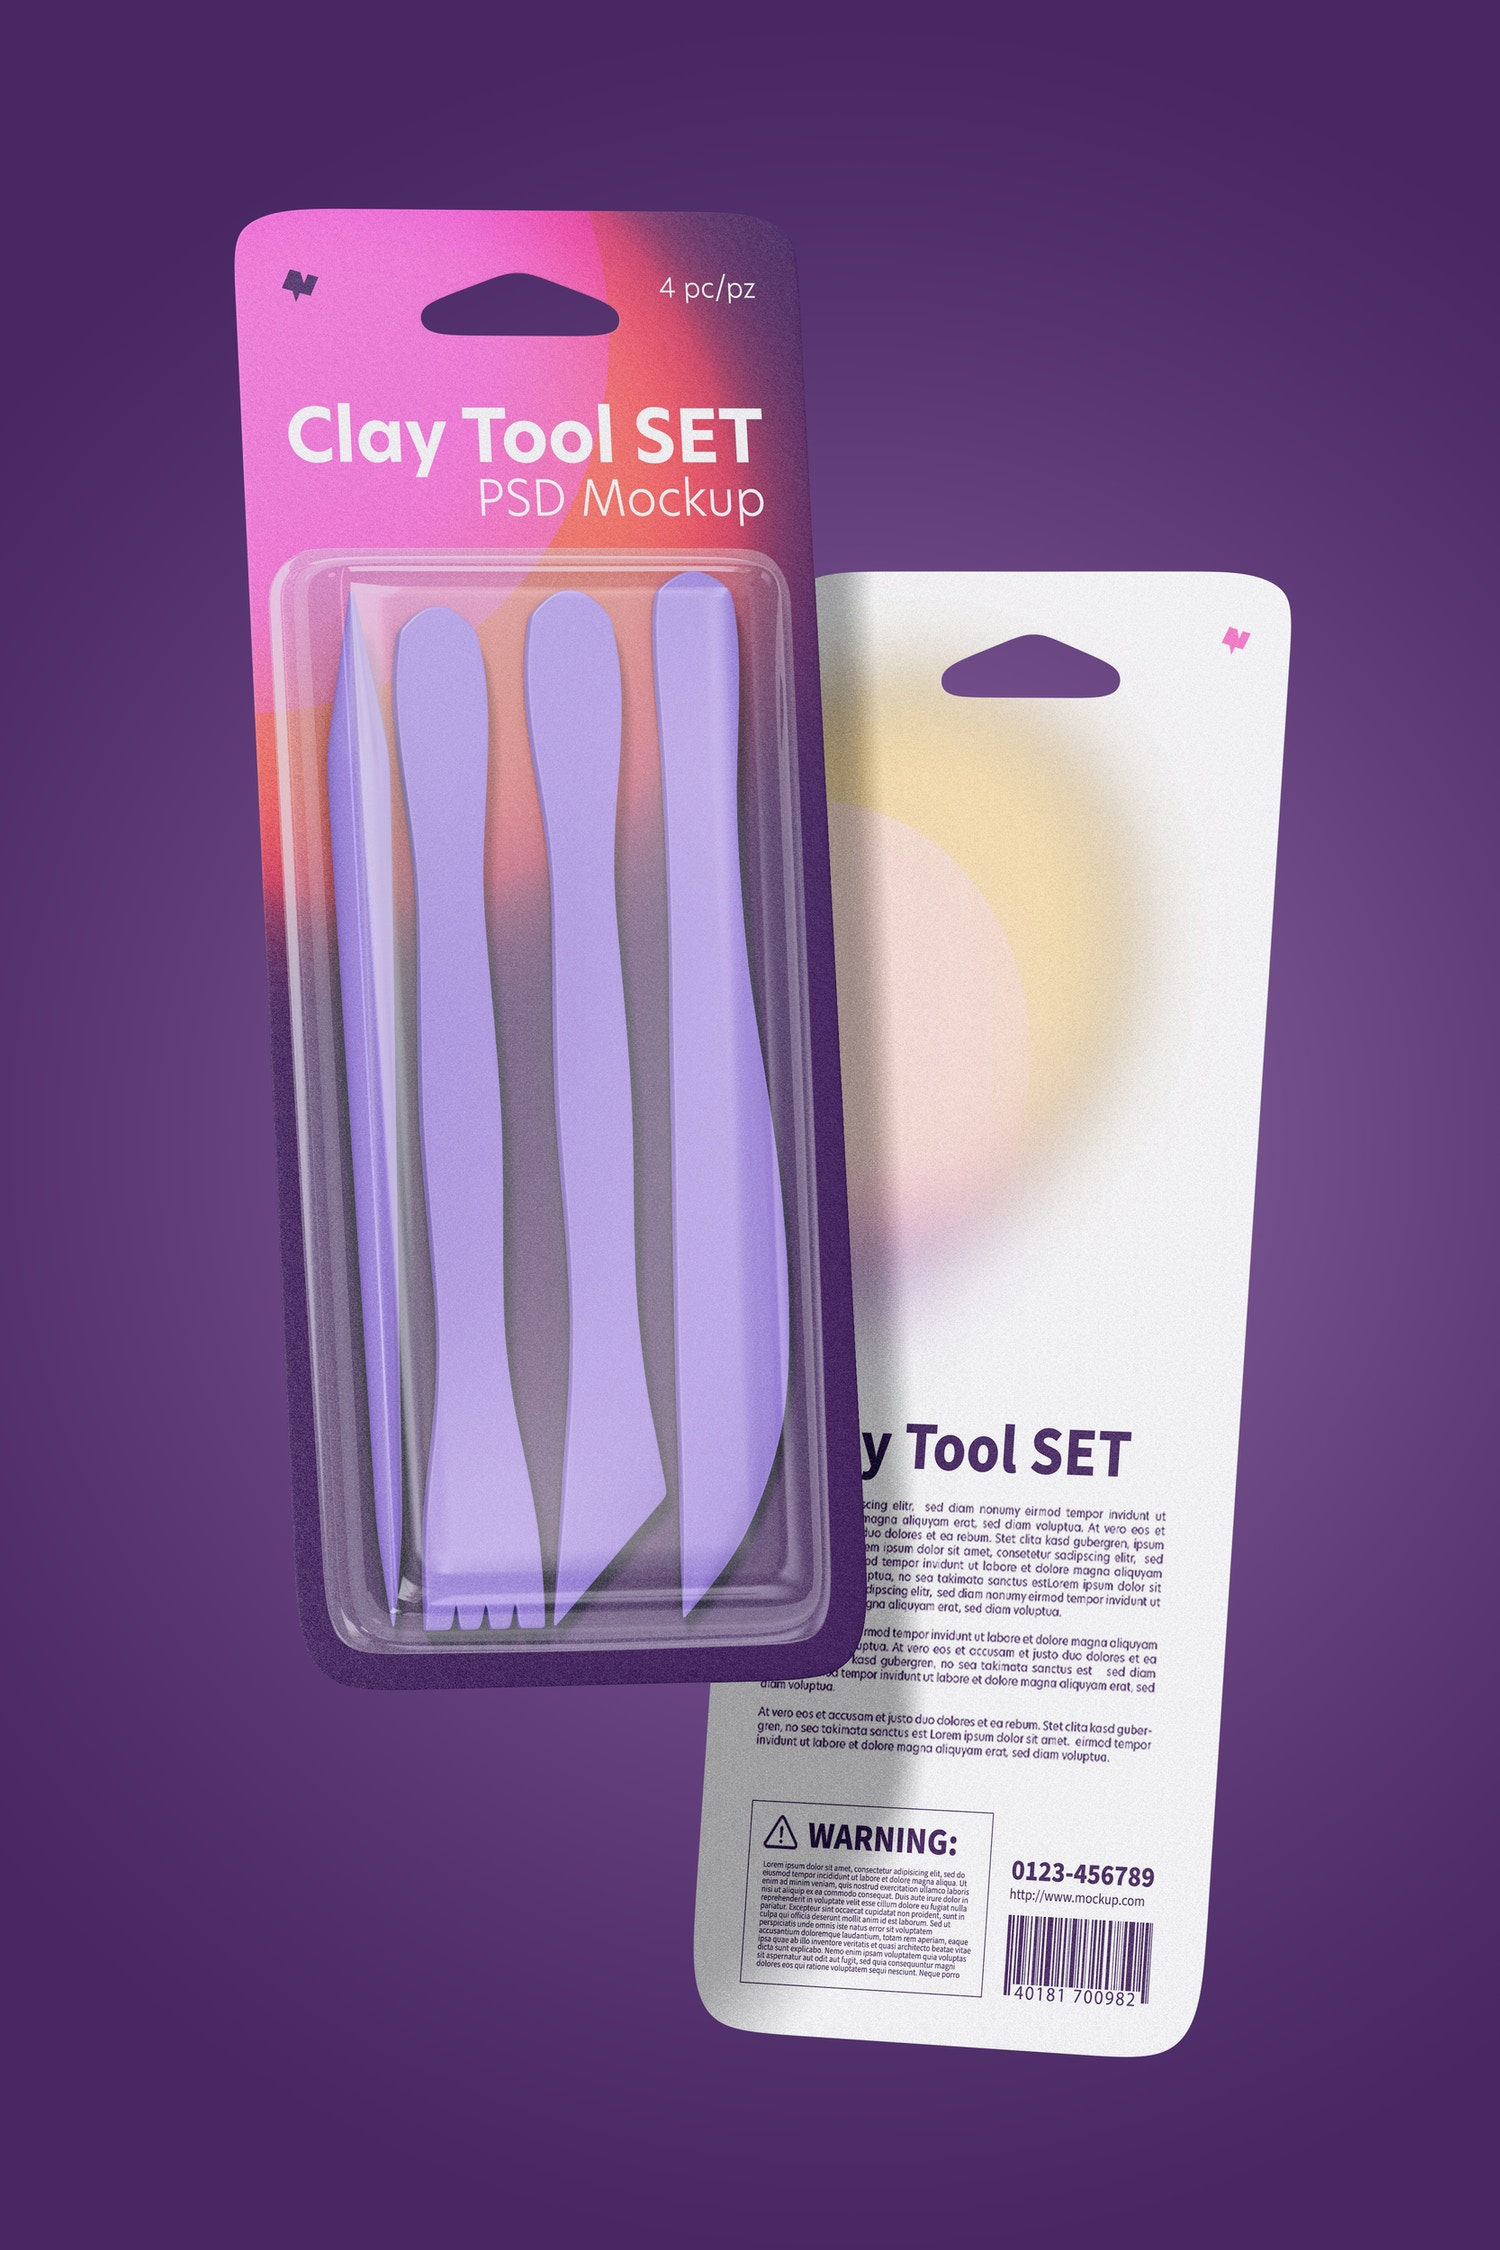 Clay Tool Set Mockup, Floating